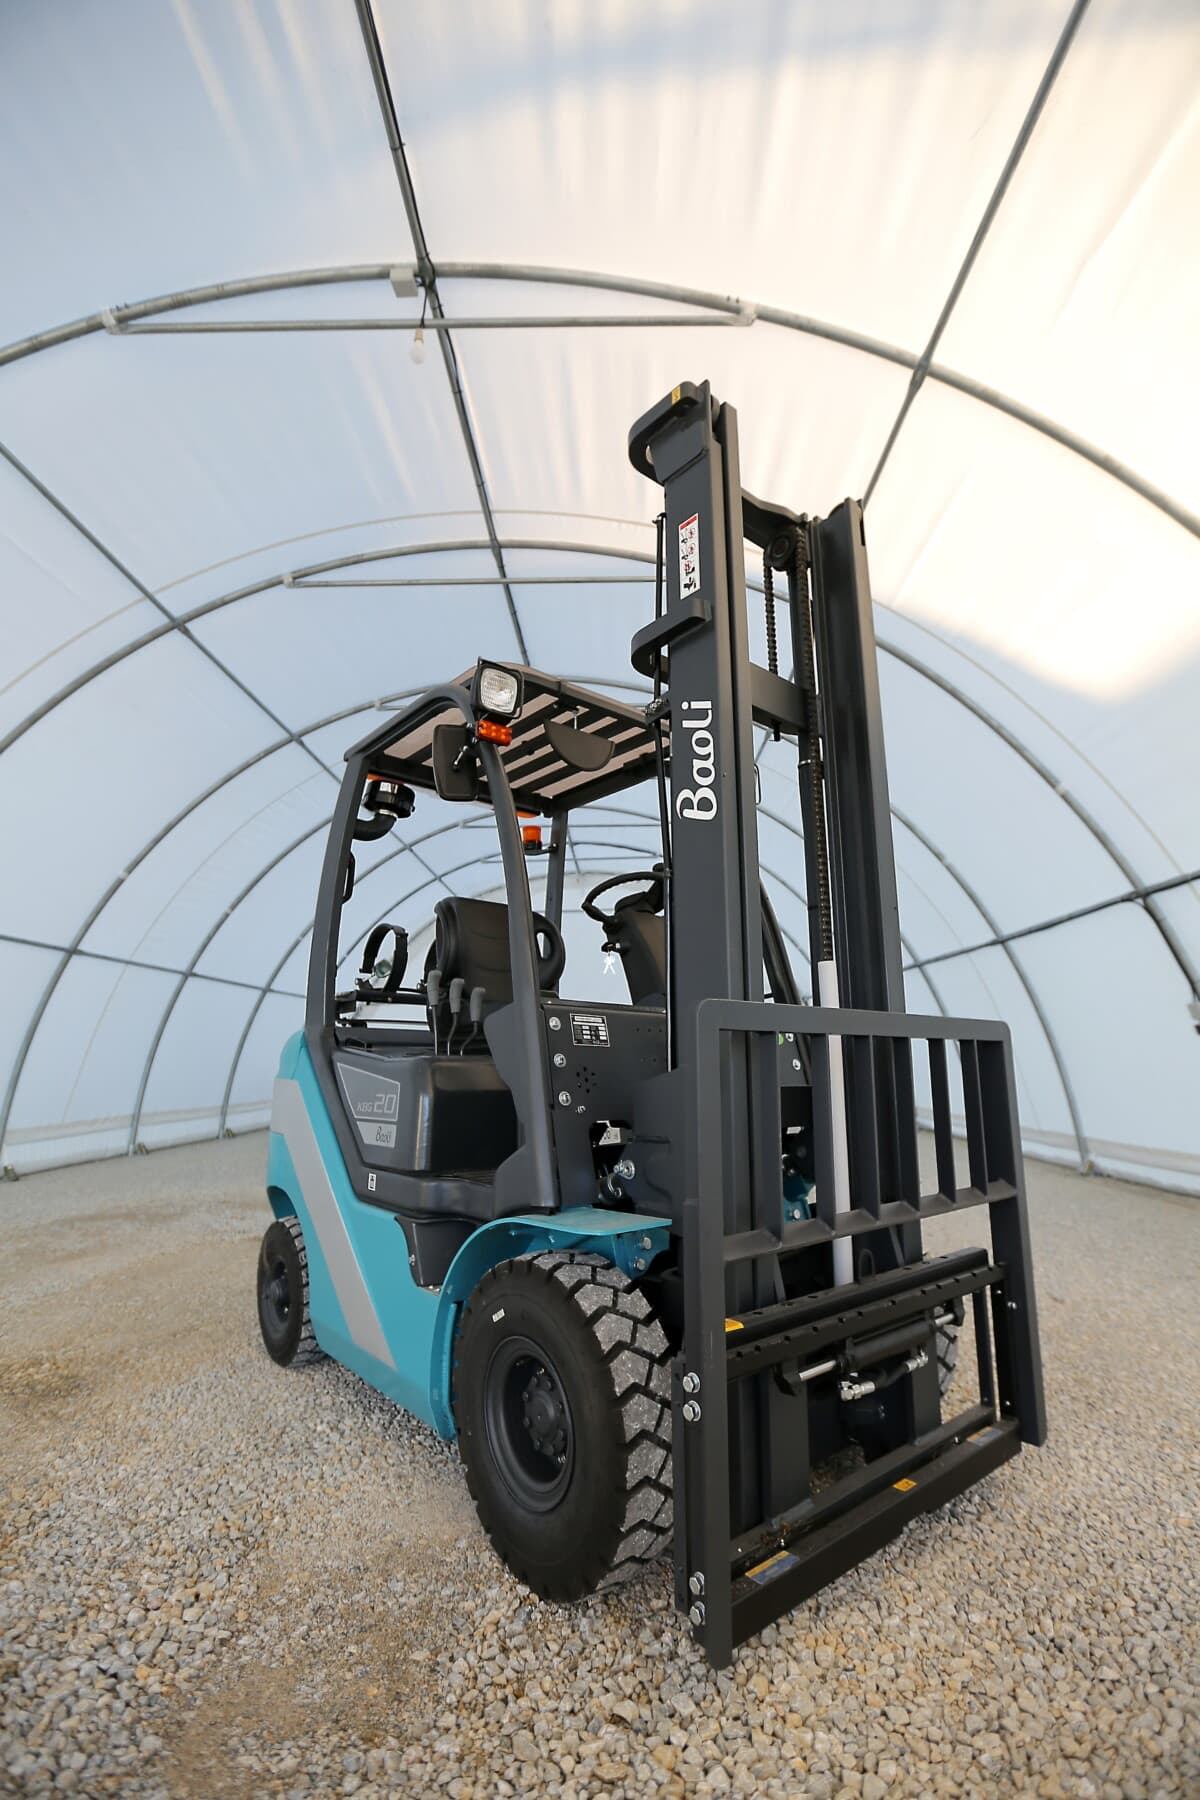 forklift, industry, warehouse, vehicle, transportation, machine, machinery, heavy, wheel, business